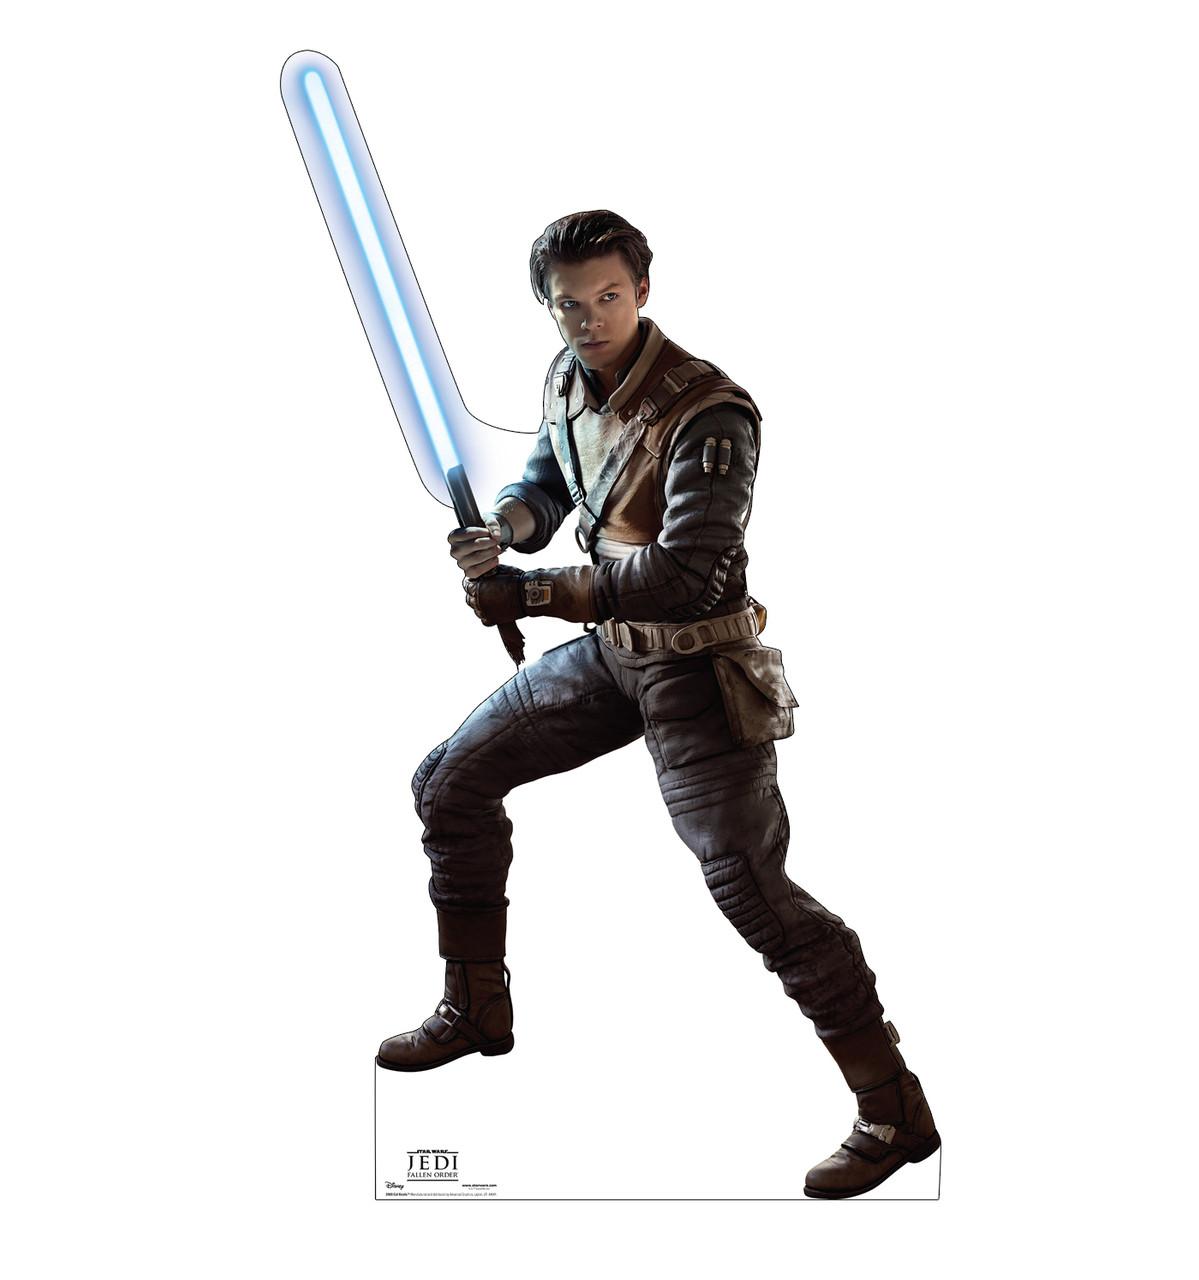 Life-size cardboard standee of Cal Kestis from Jedi Fallen Order.